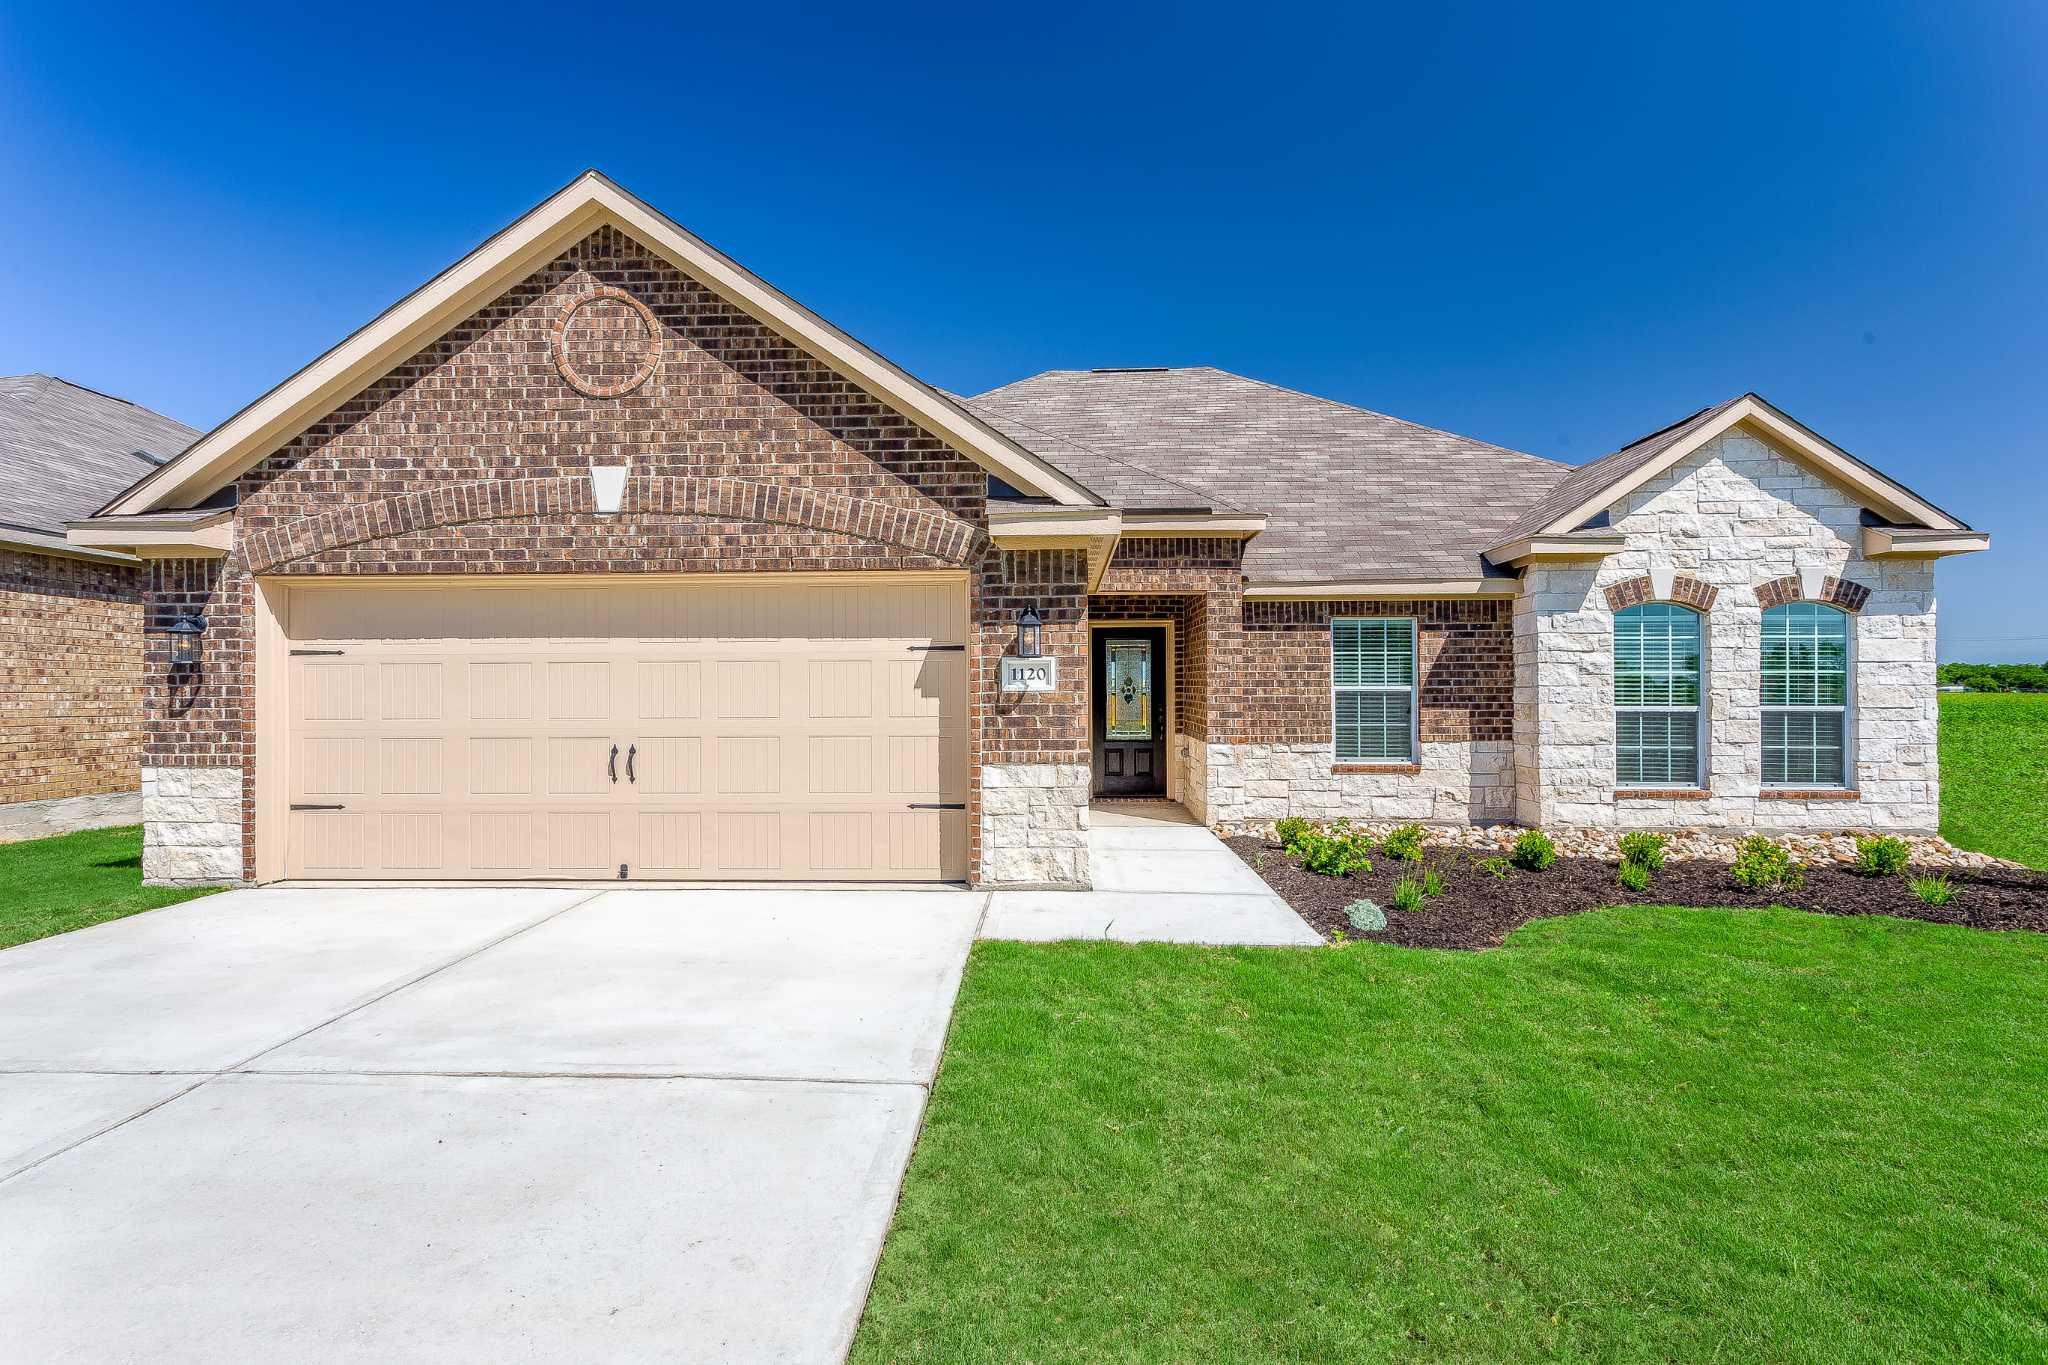 LGI Homes introduces Ranch Crest in northwest Houston Houston